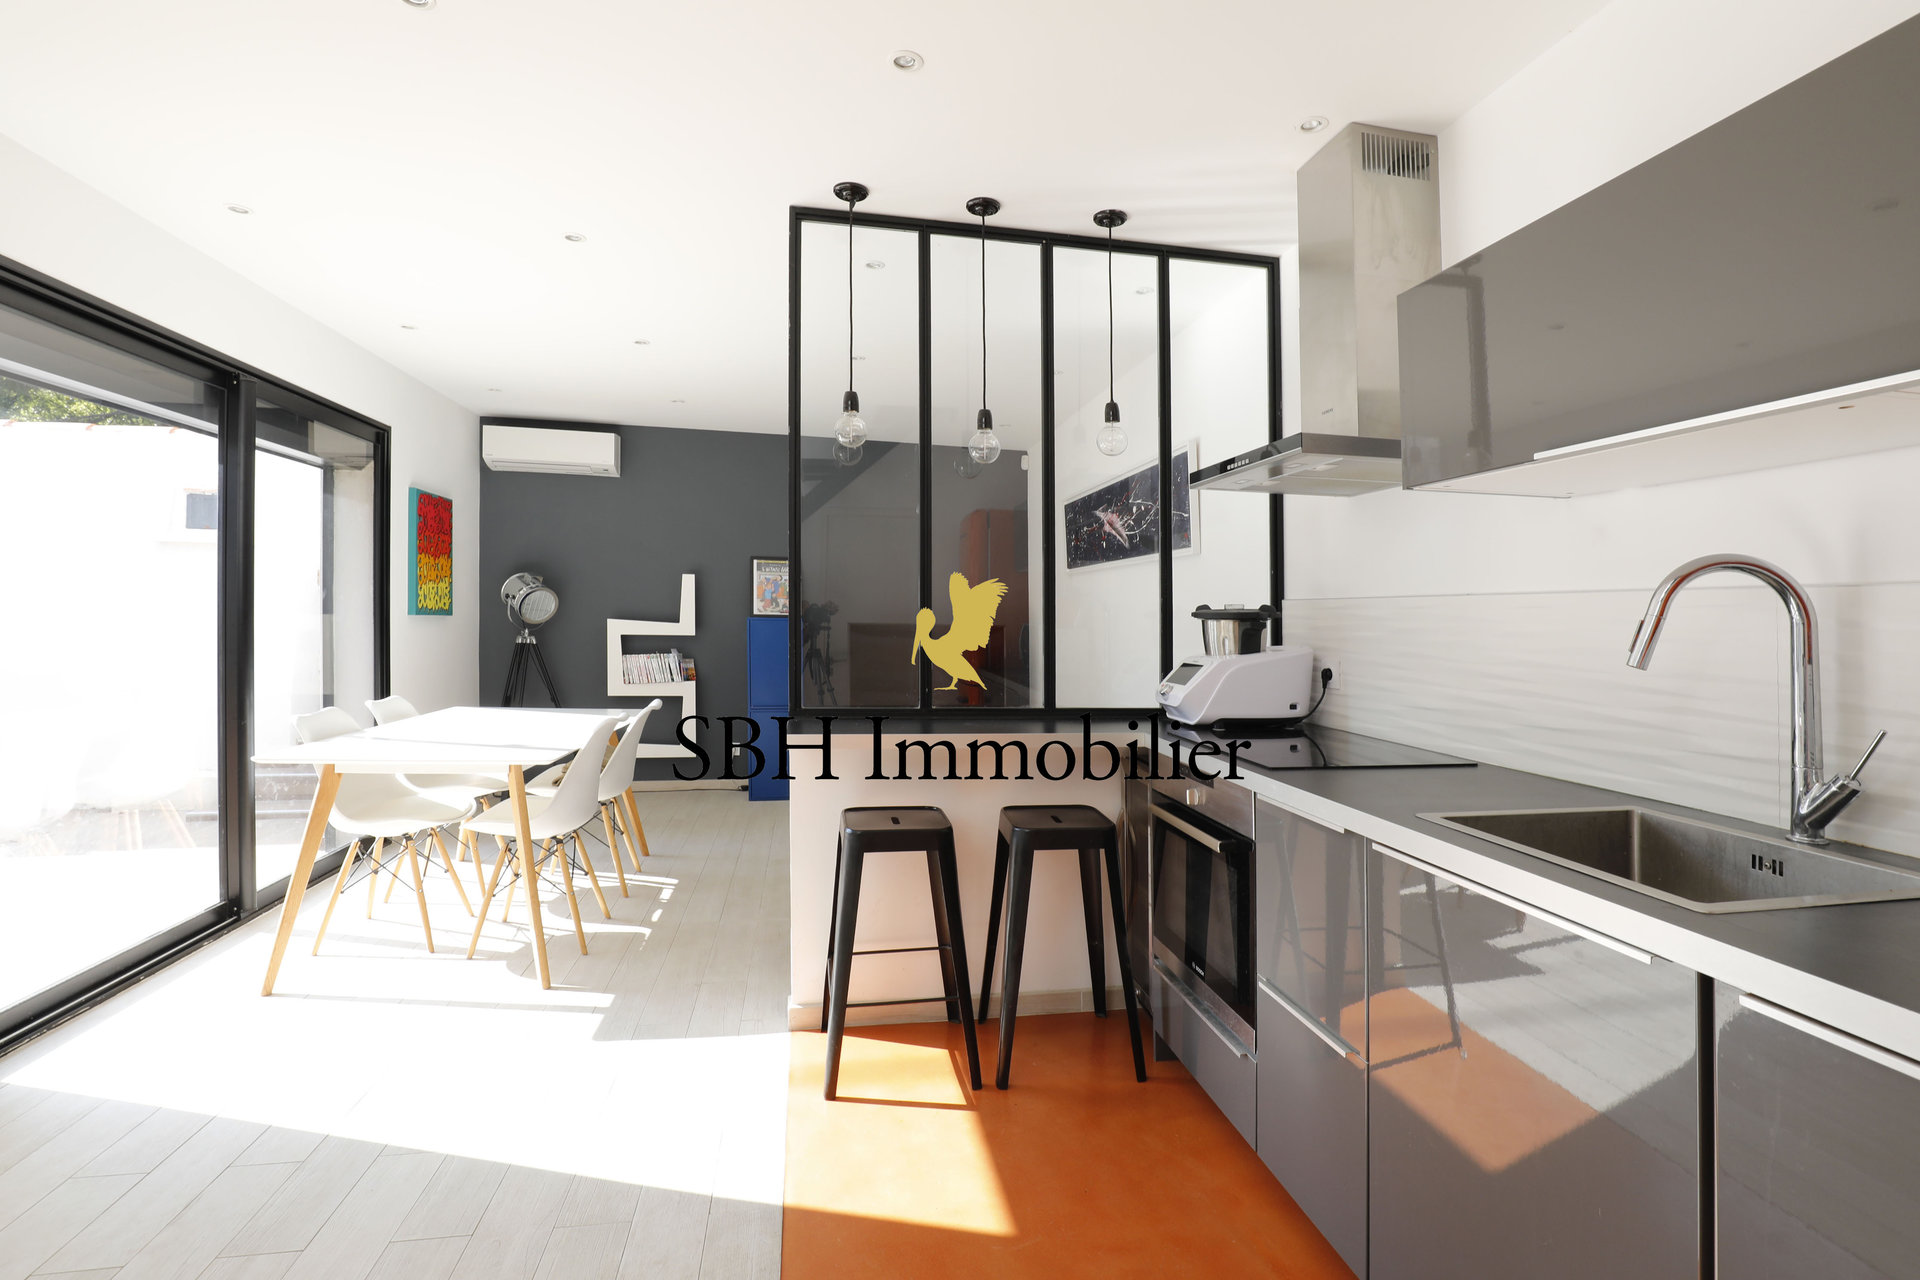 Superbe maison contemporaine avec jardin